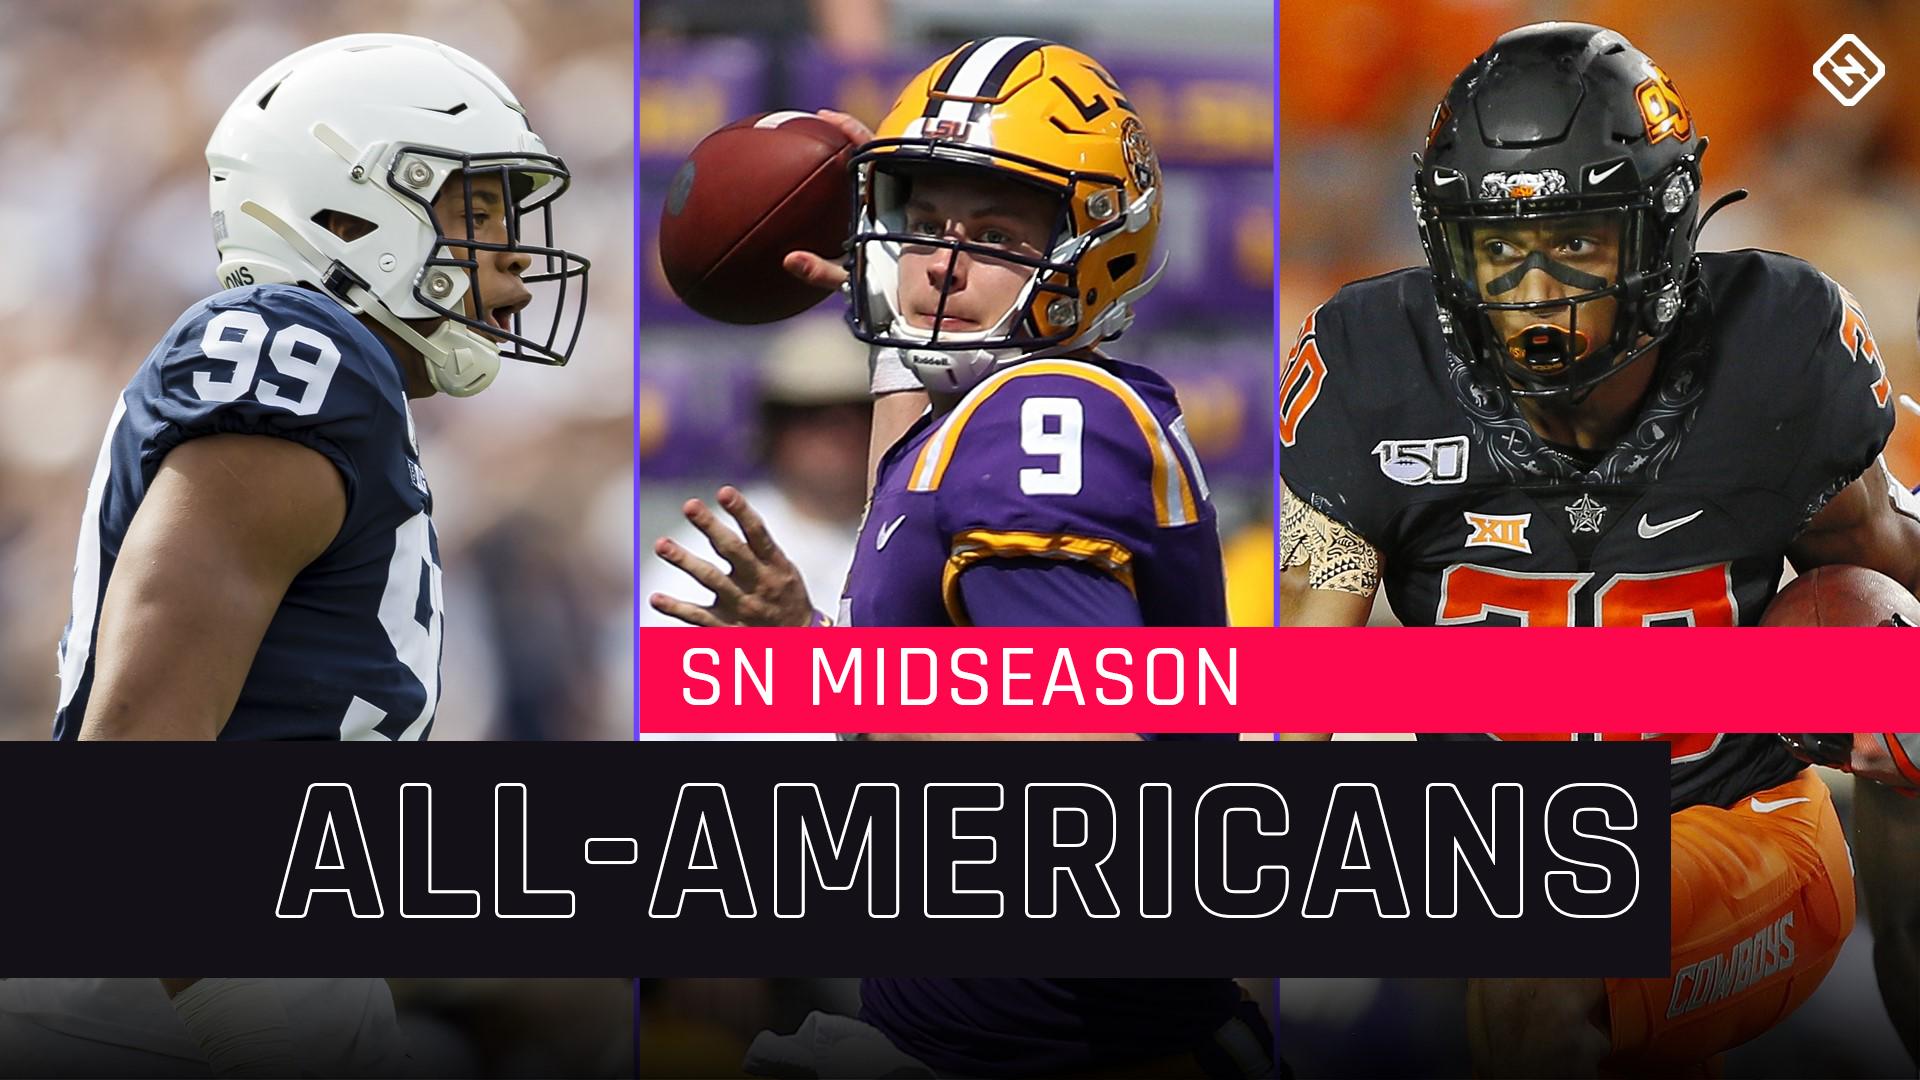 Sporting News 2019 midseason All-Americans